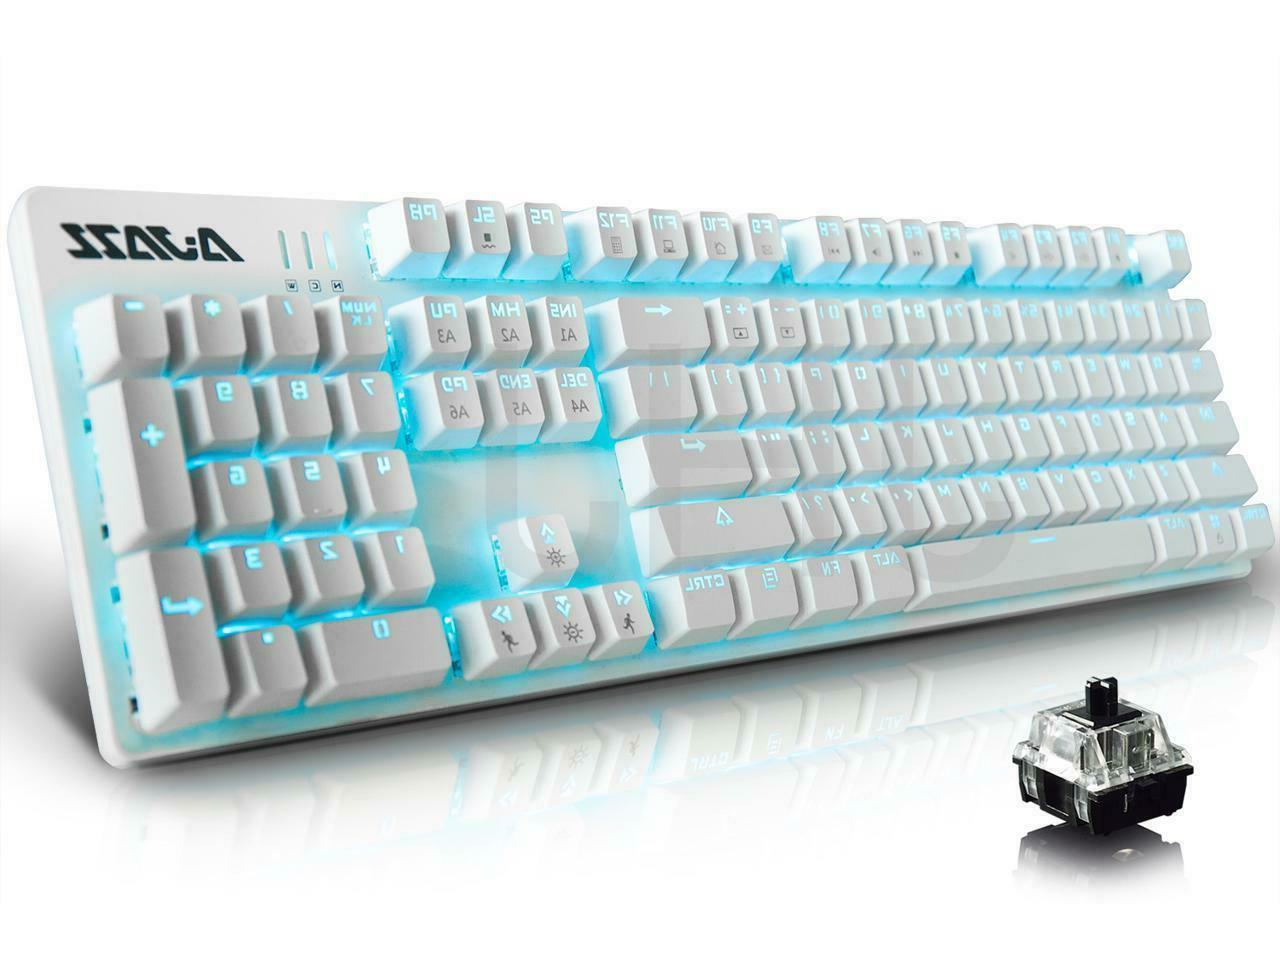 Ajazz AK52 Gaming Keyboard 104 Keys/Backlit USB